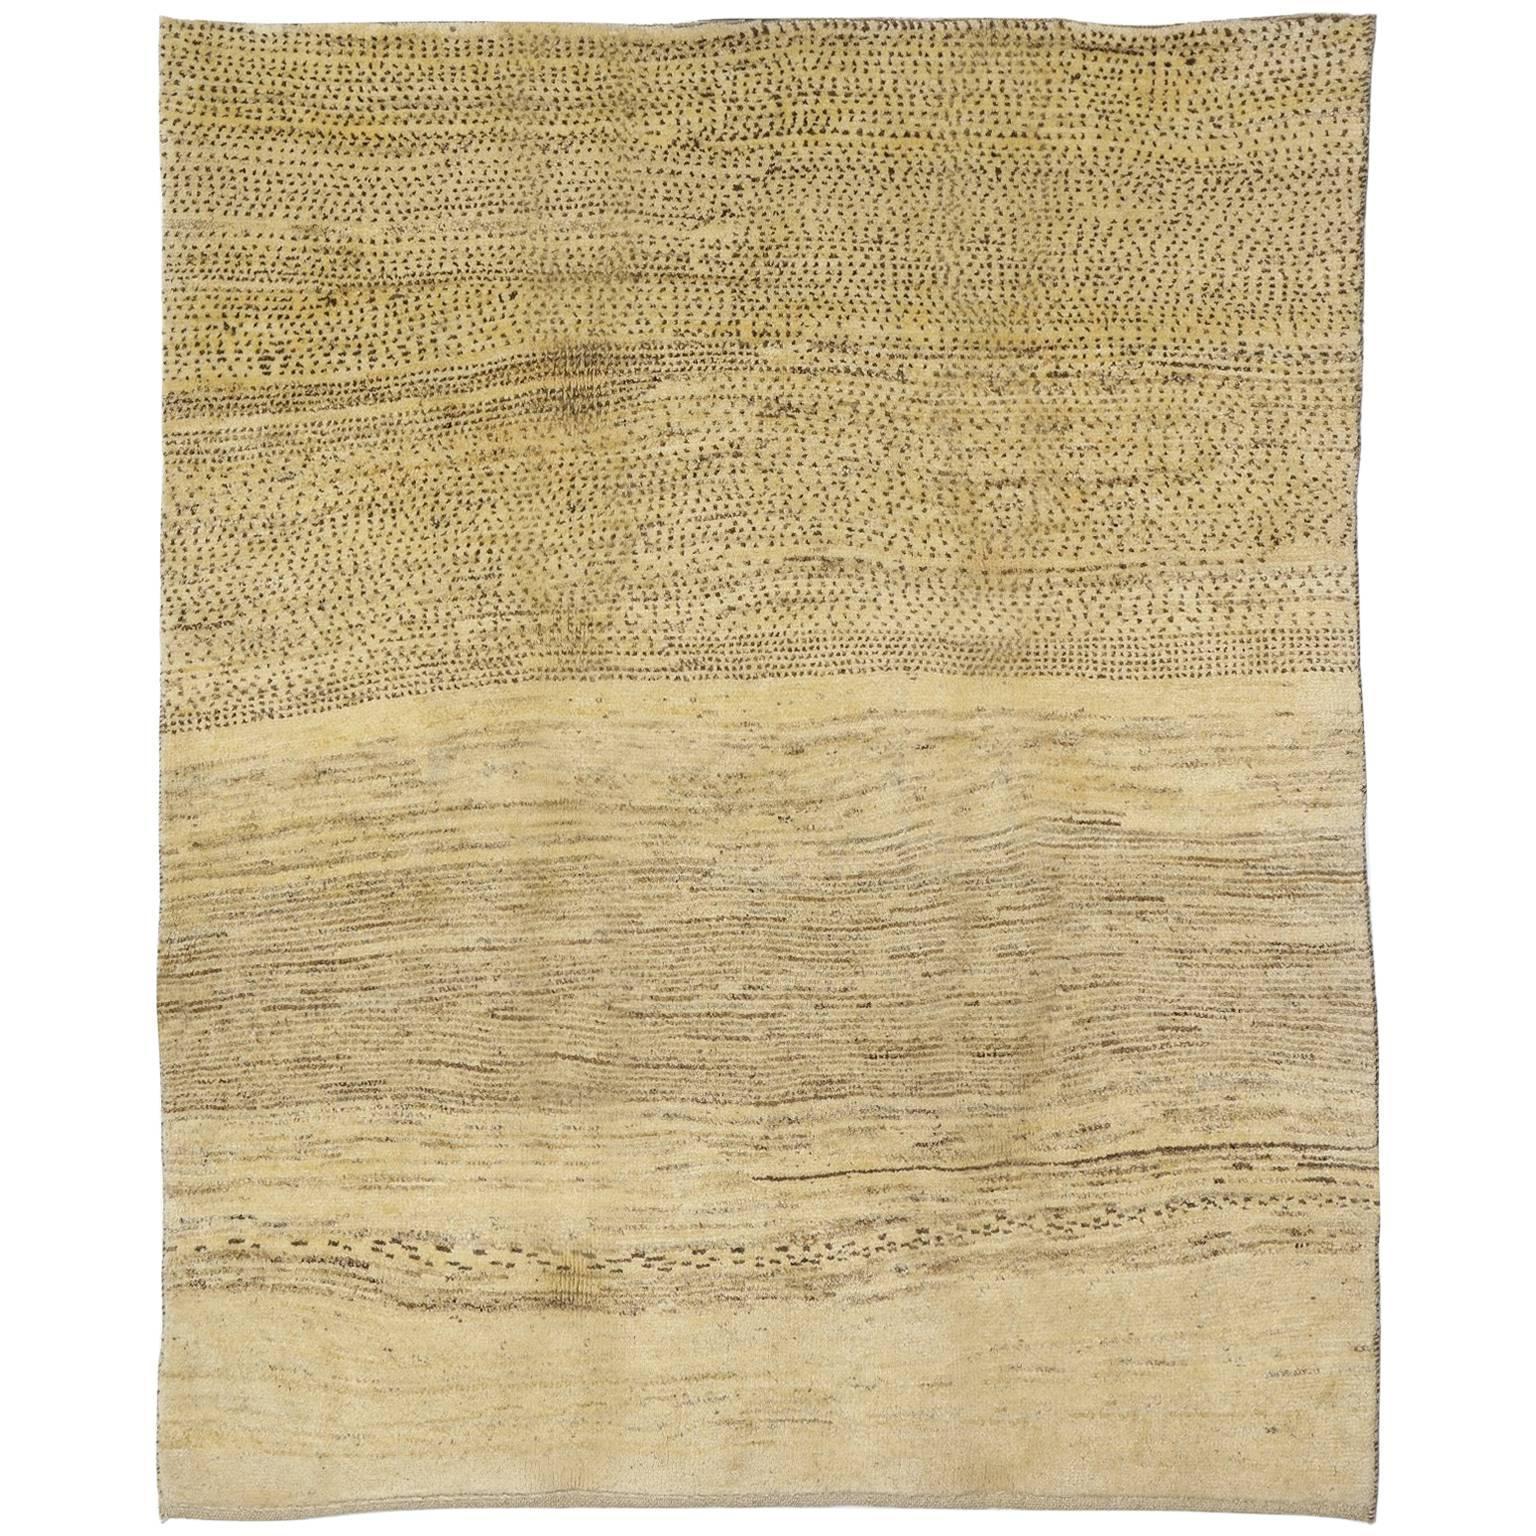 Orley Shabahang Gabehrez Carpet in Undyed Handspun Wool